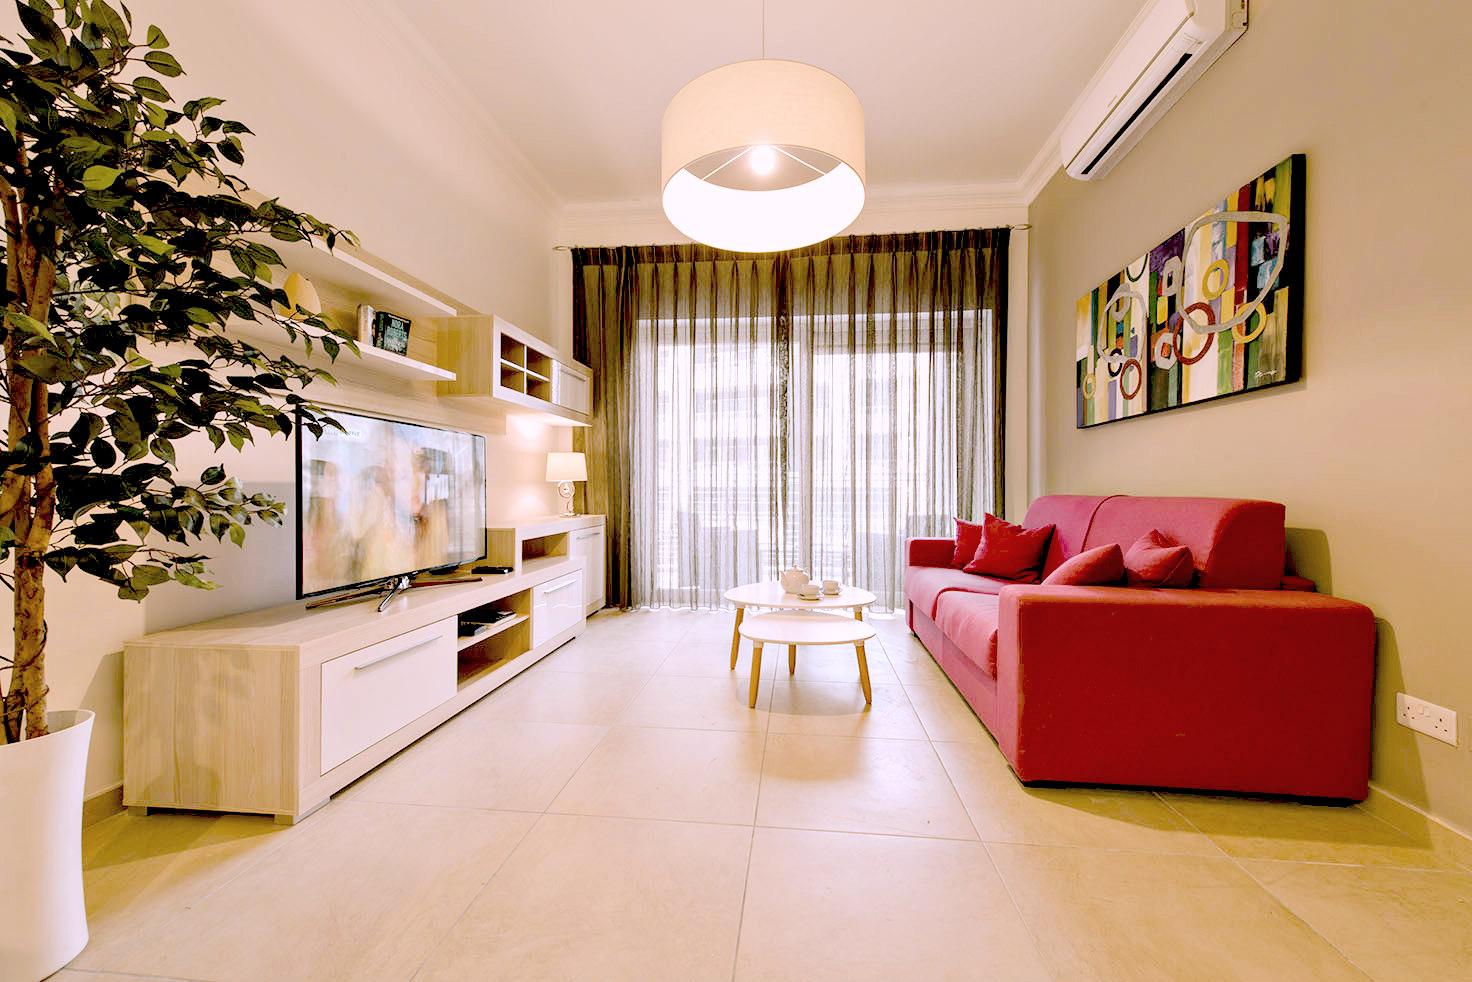 Luxury apartment in fort cambridge buena vista holidays for One bedroom apartment cambridge